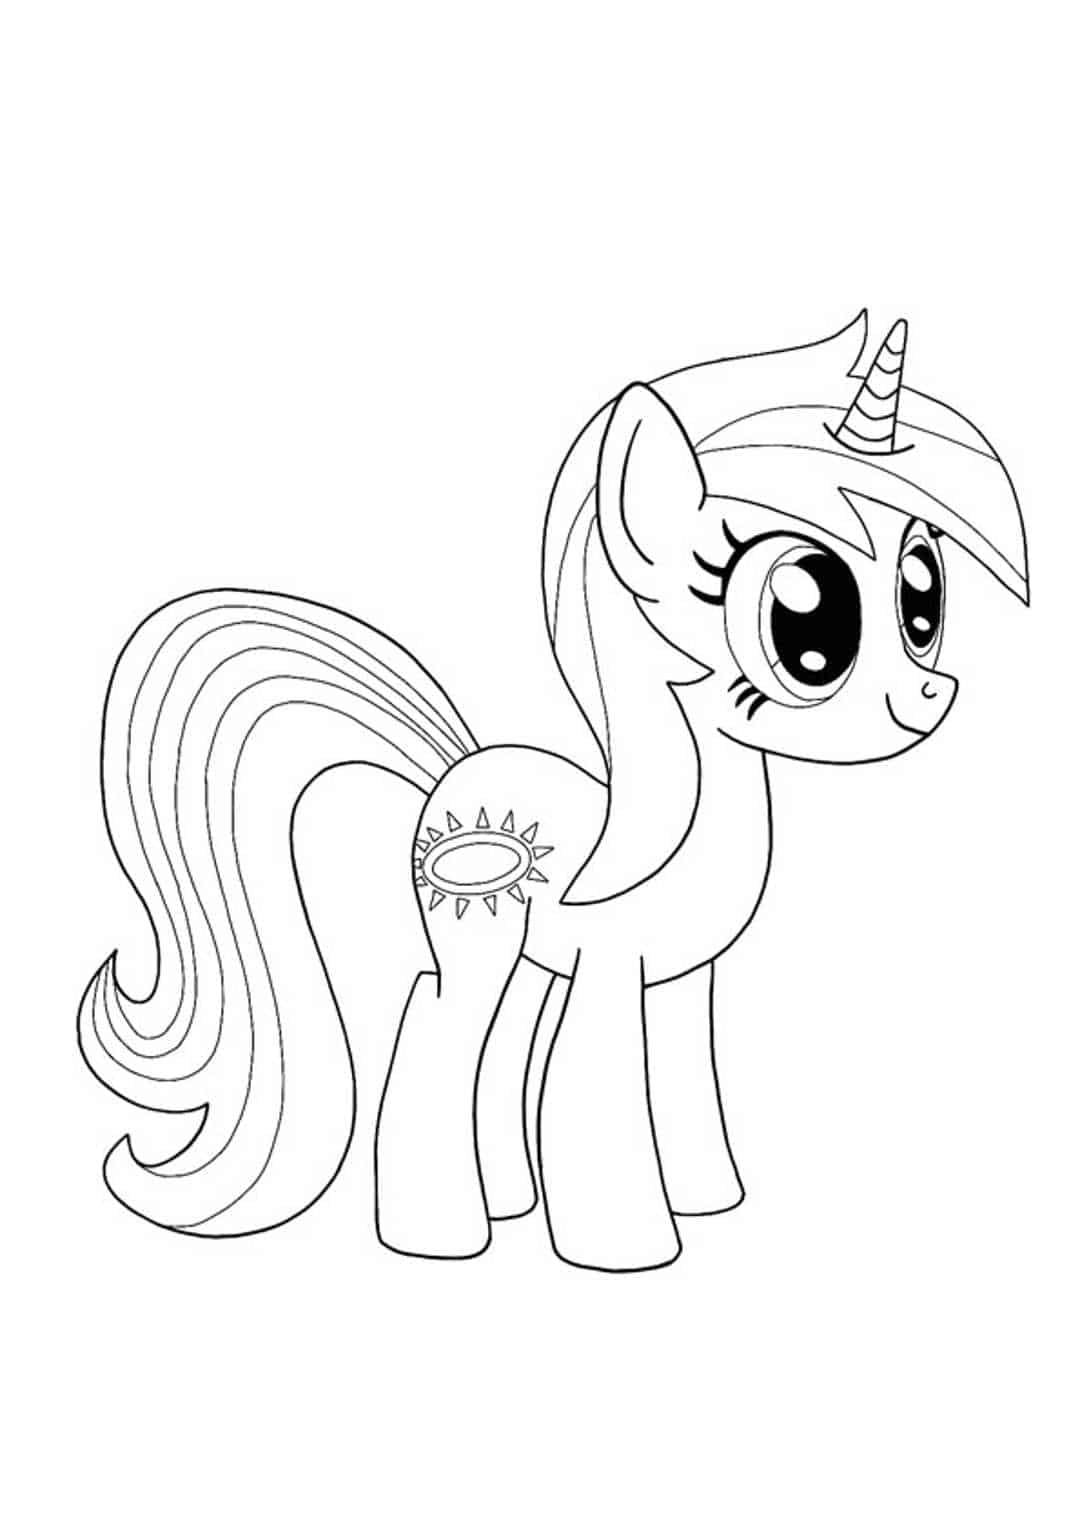 Twilight Sparkle My Little Pony Unicorn coloring page